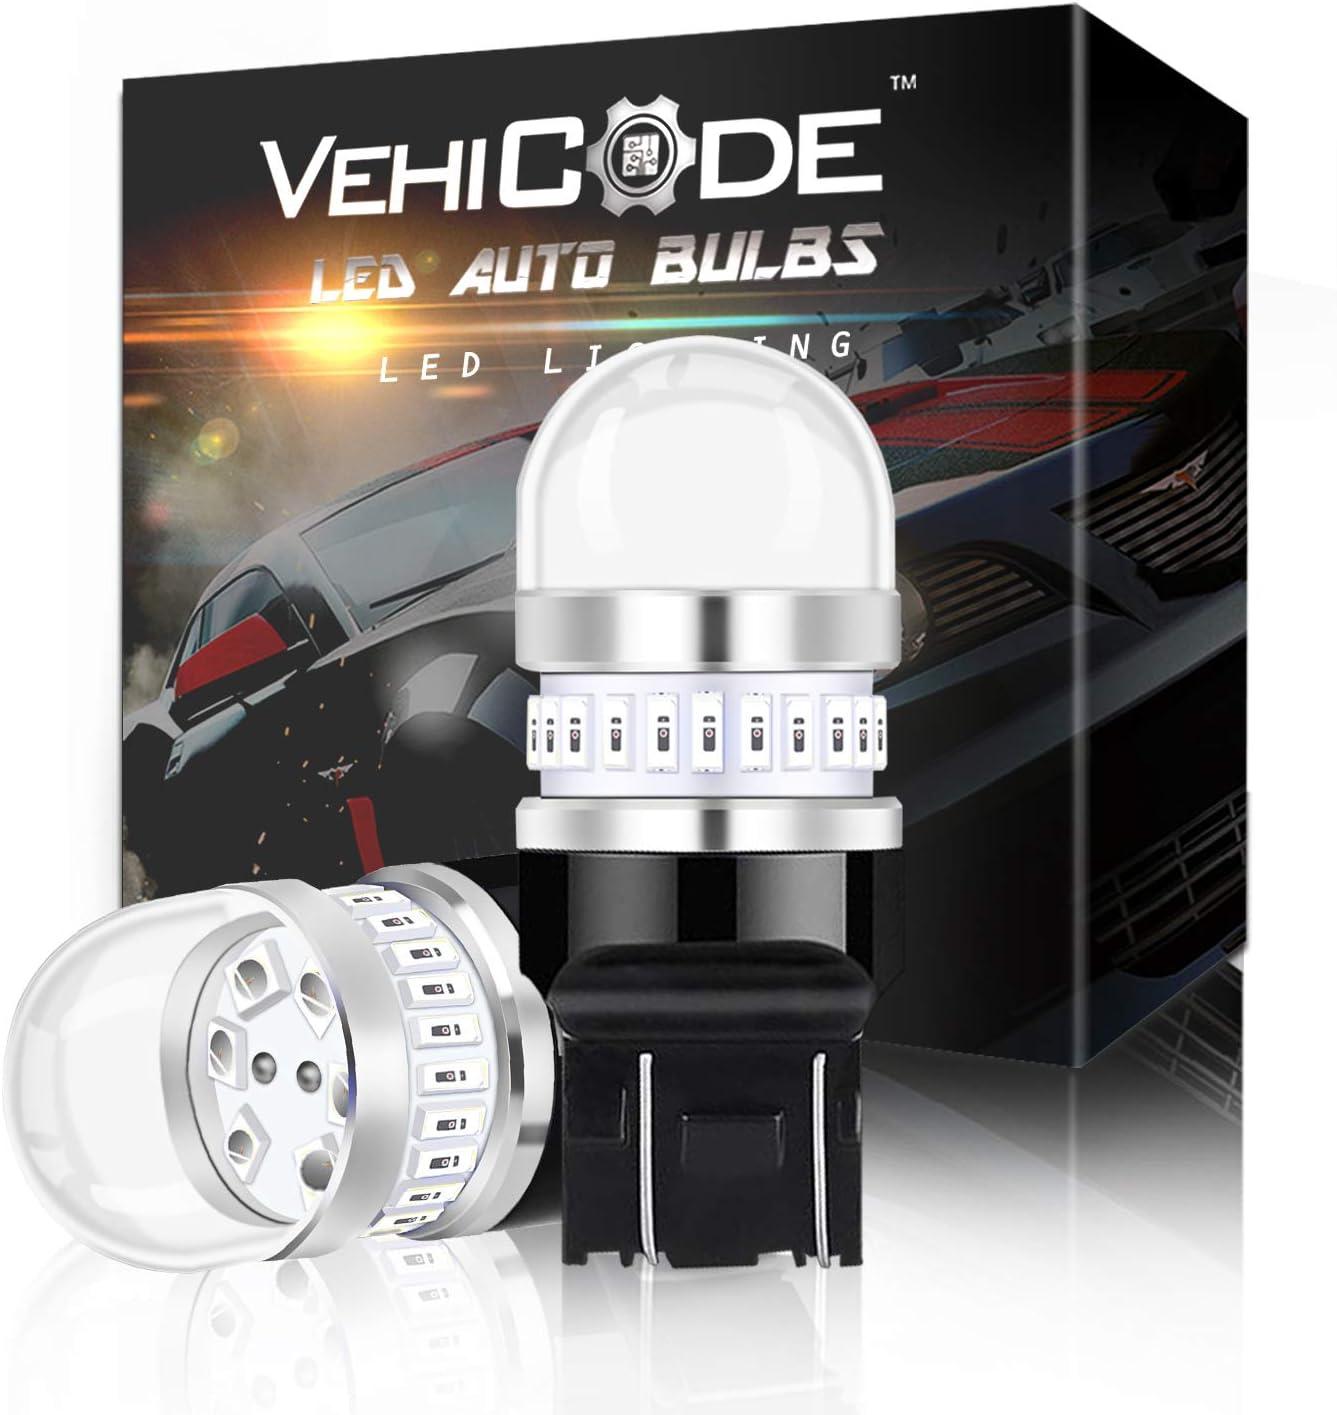 VehiCode 1156 Red LED Strobe Brake Light Bulb Kit 2 Pack 5-Times Warning Flash 7506 1141 93 P21W BA15S Rear Tail Brake Stop Light Lamp Replacement for Car Harley Motorcycle Emergency Caution